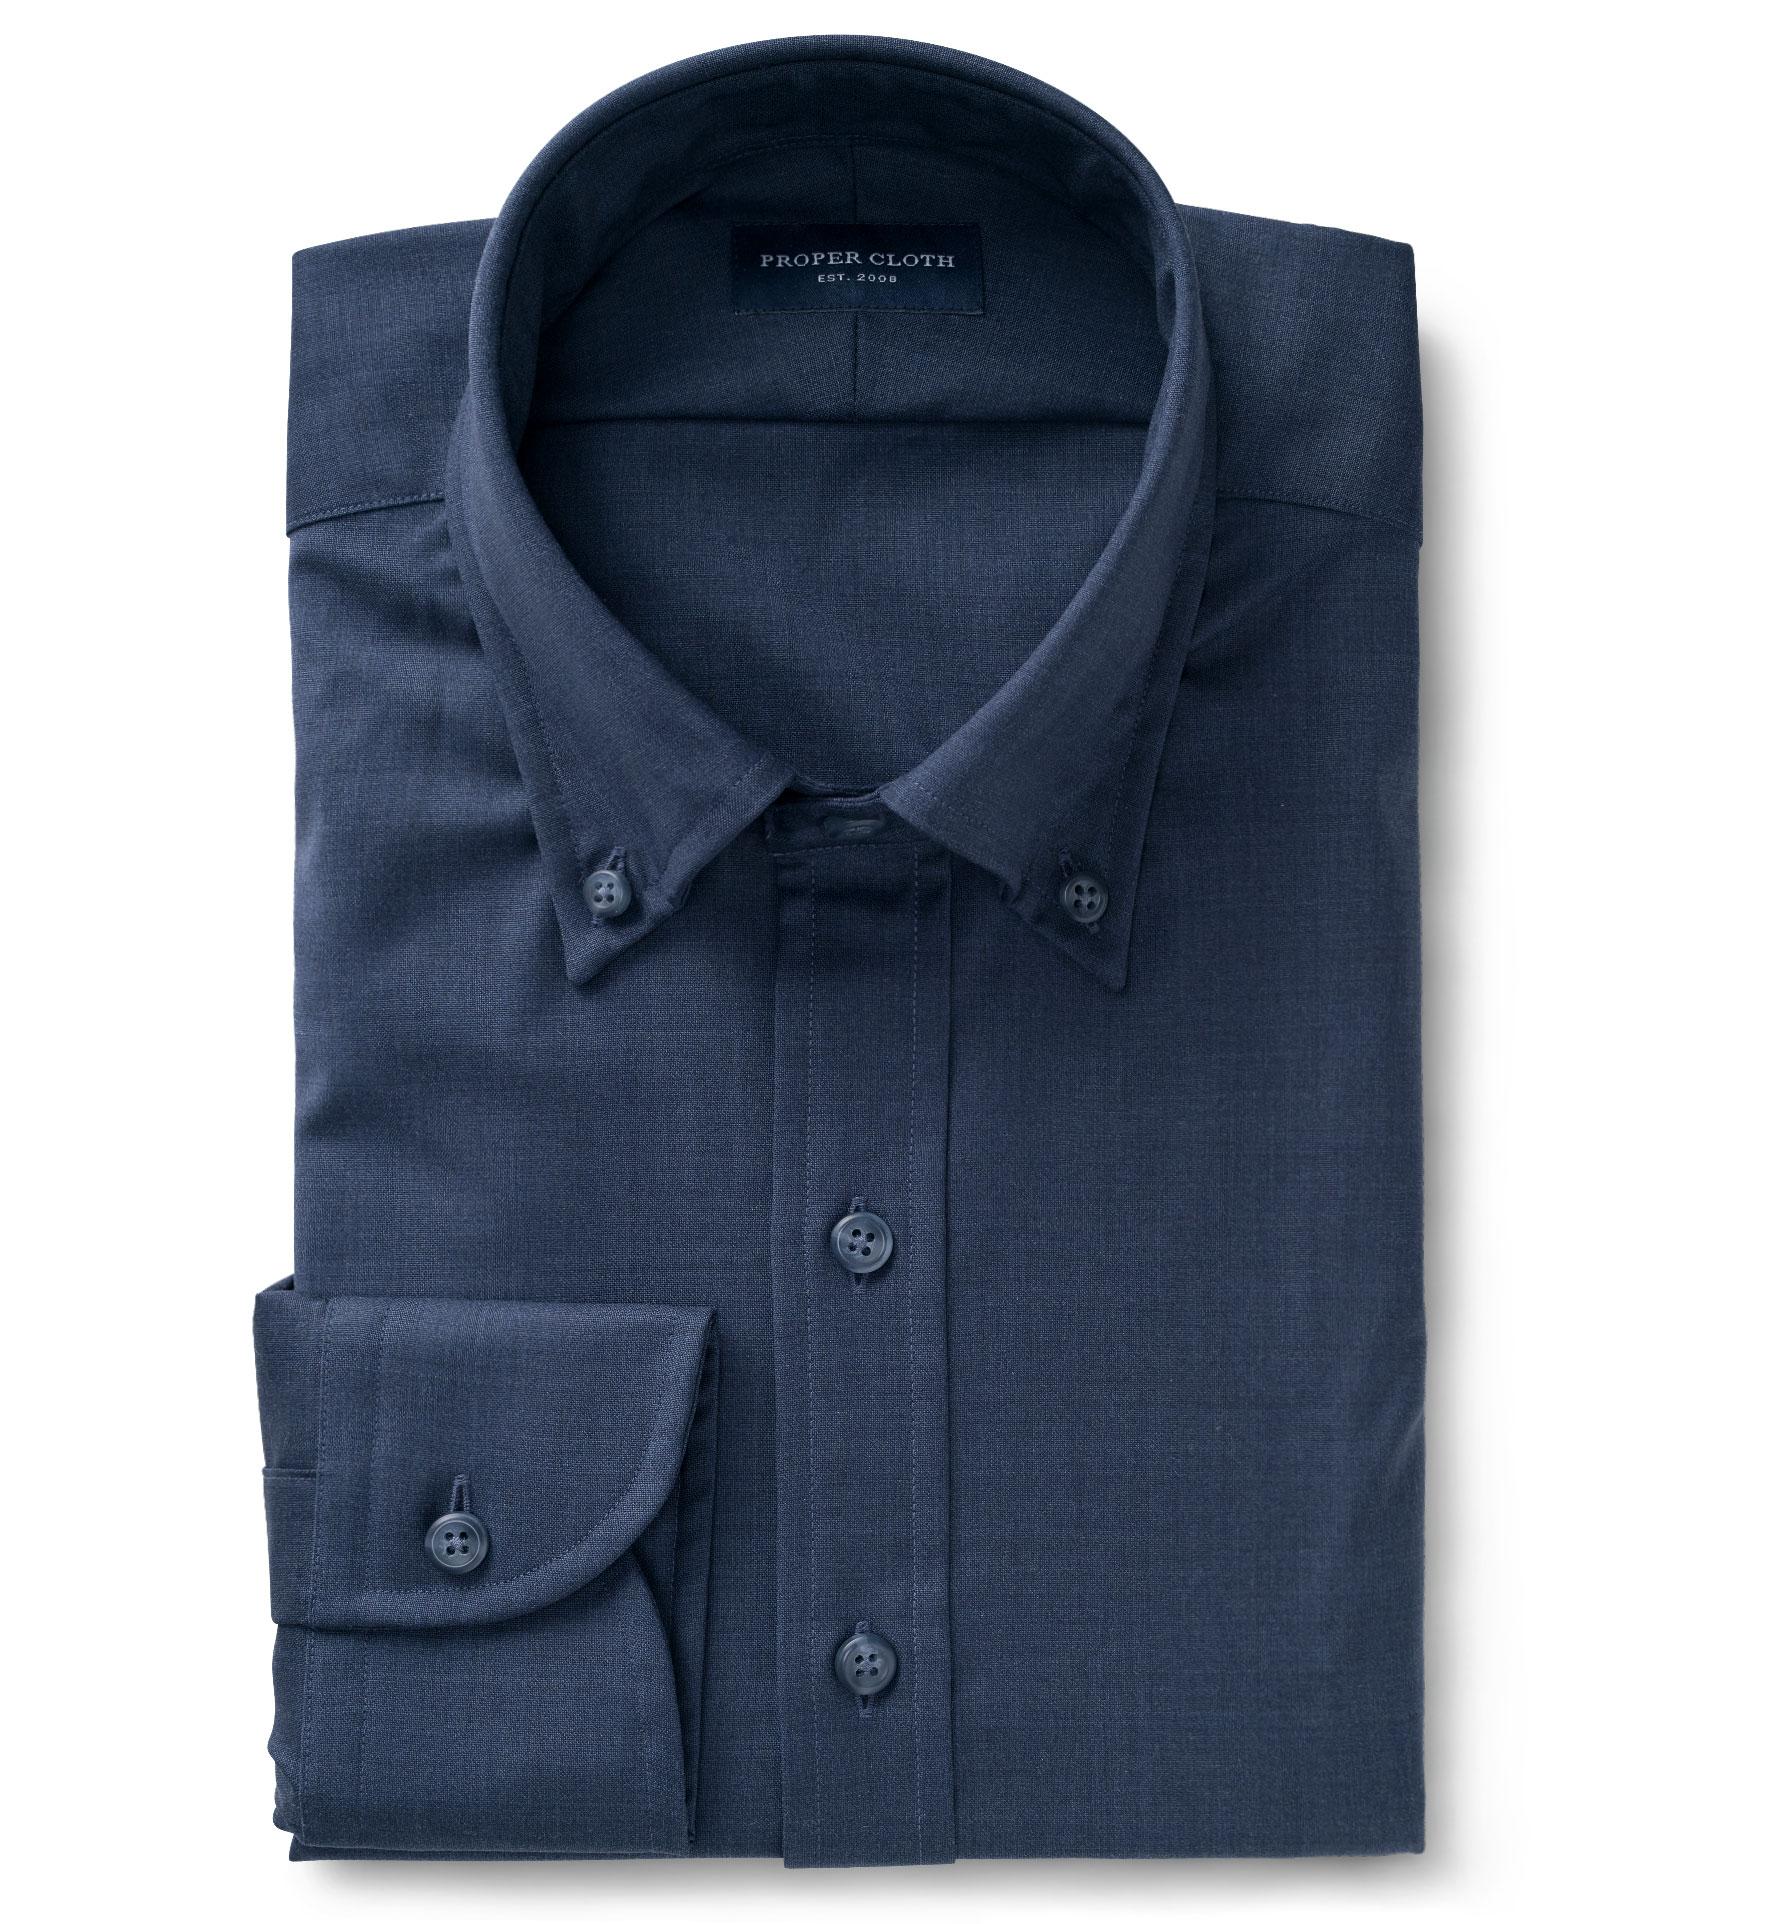 Reda Slate Blue Merino Wool Custom Dress Shirt By Proper Cloth